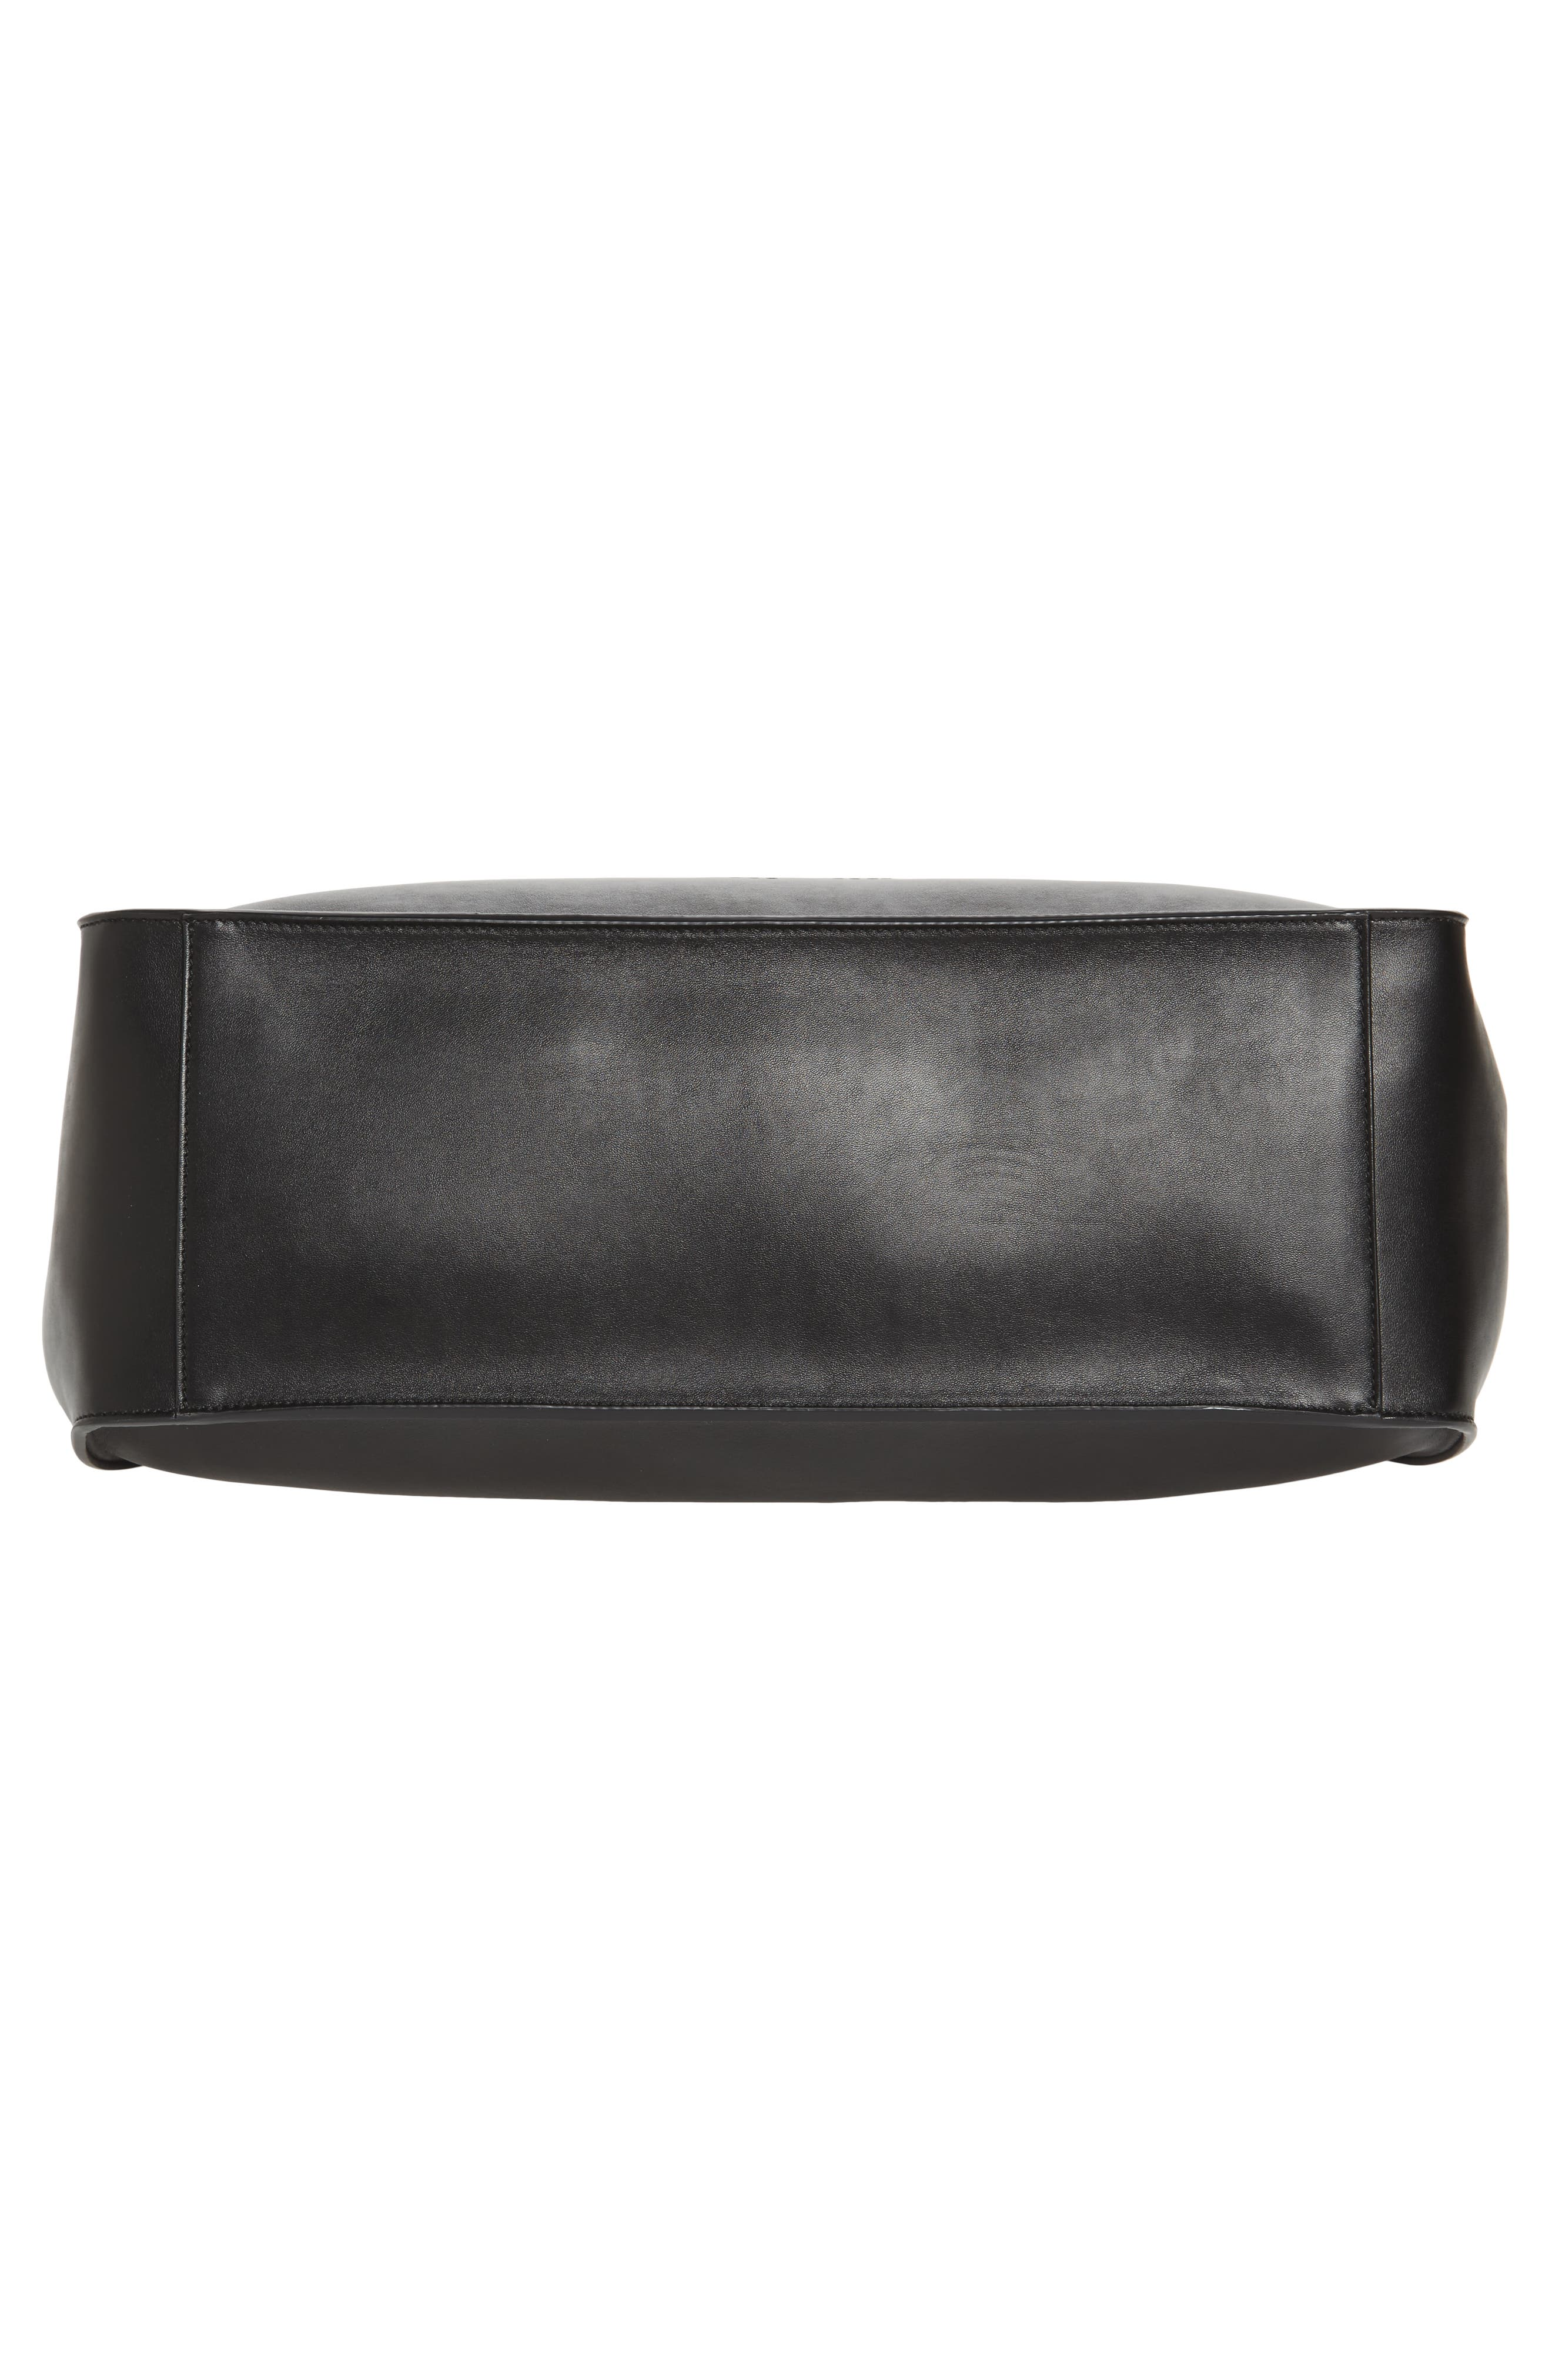 STELLA MCCARTNEY, Medium Perforated Logo Faux Leather Tote, Alternate thumbnail 6, color, BLACK